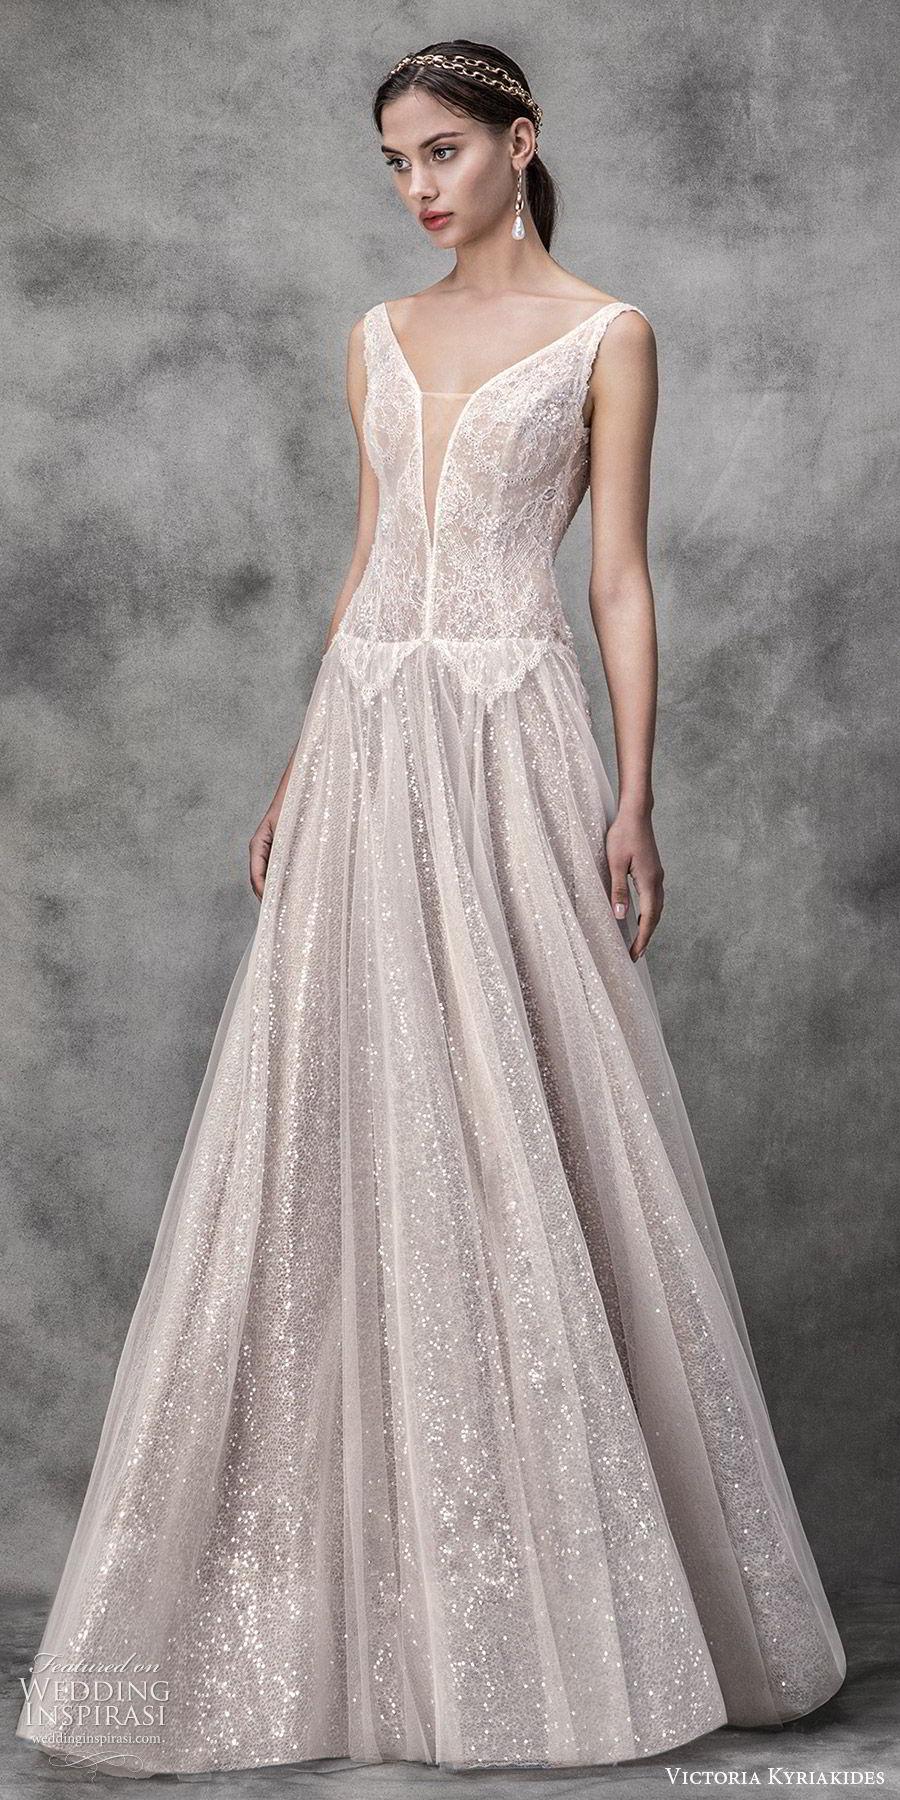 victoria kyriakides spring 2020 bridal sleeveless split sweetheart neckline drop waist fully embellished lace a line ball gown wedding dress (15) blush romantic glitzy mv